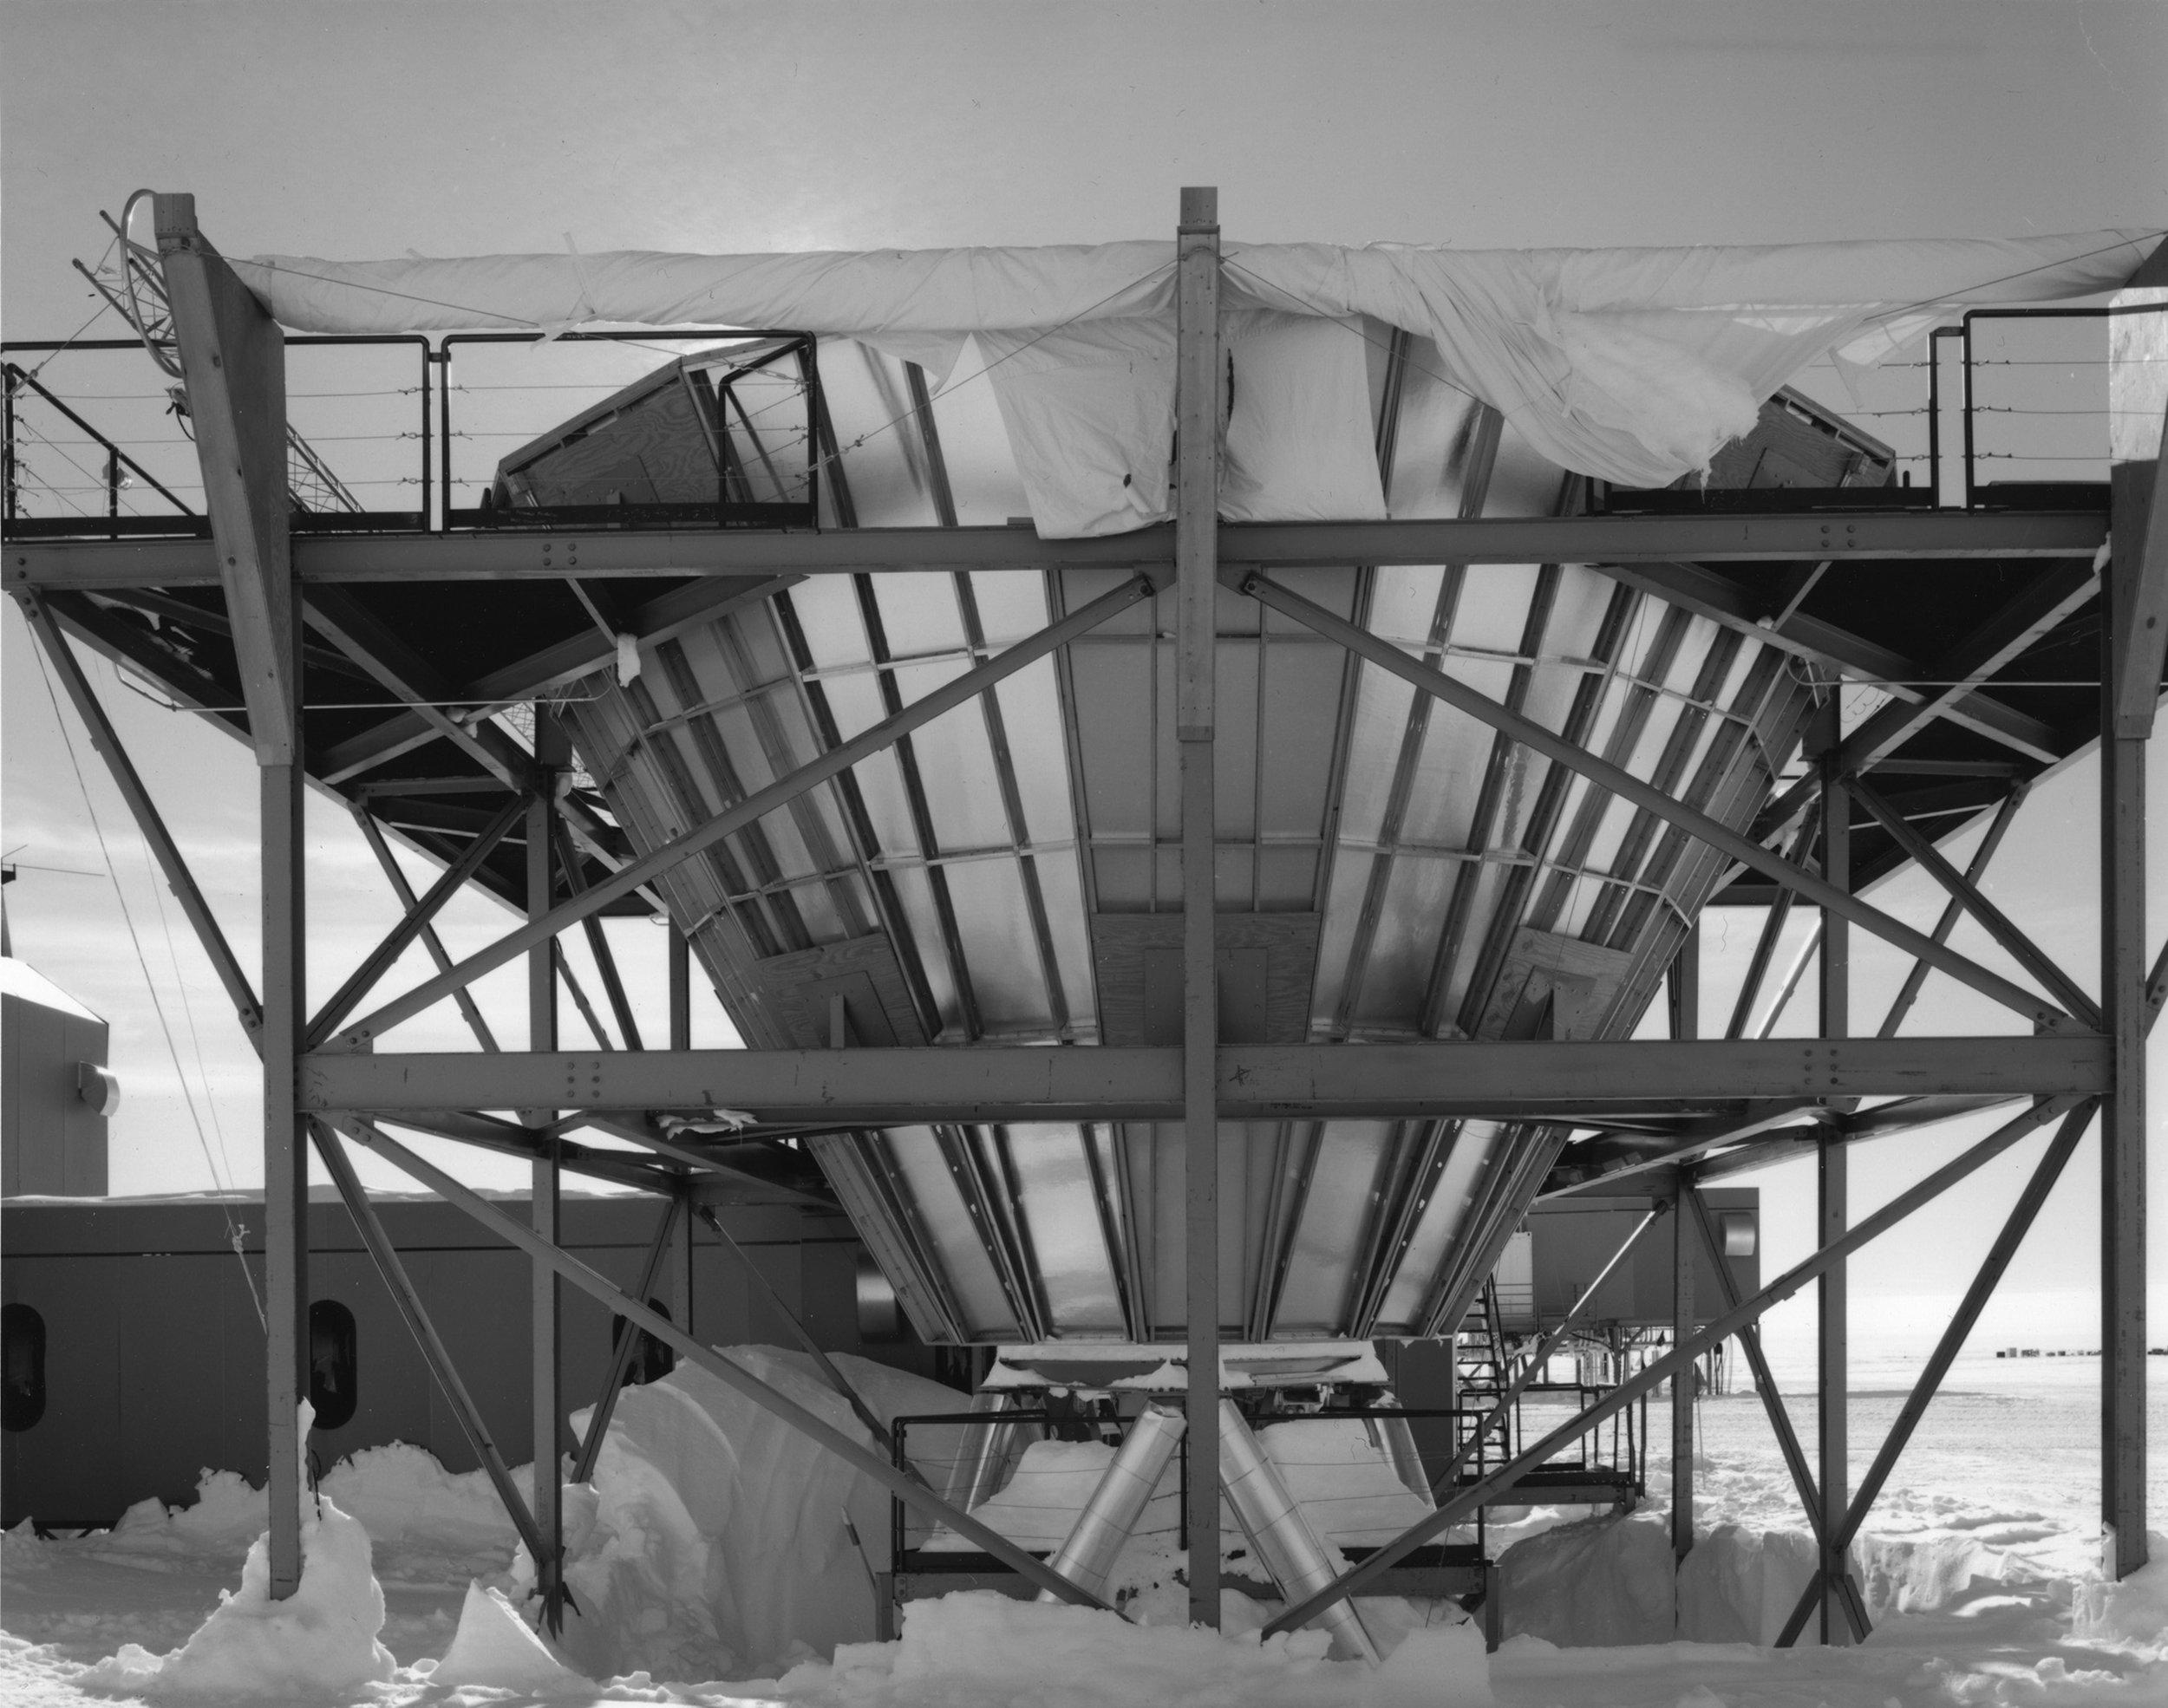 09 12 35 MAPO South Pole P.jpg